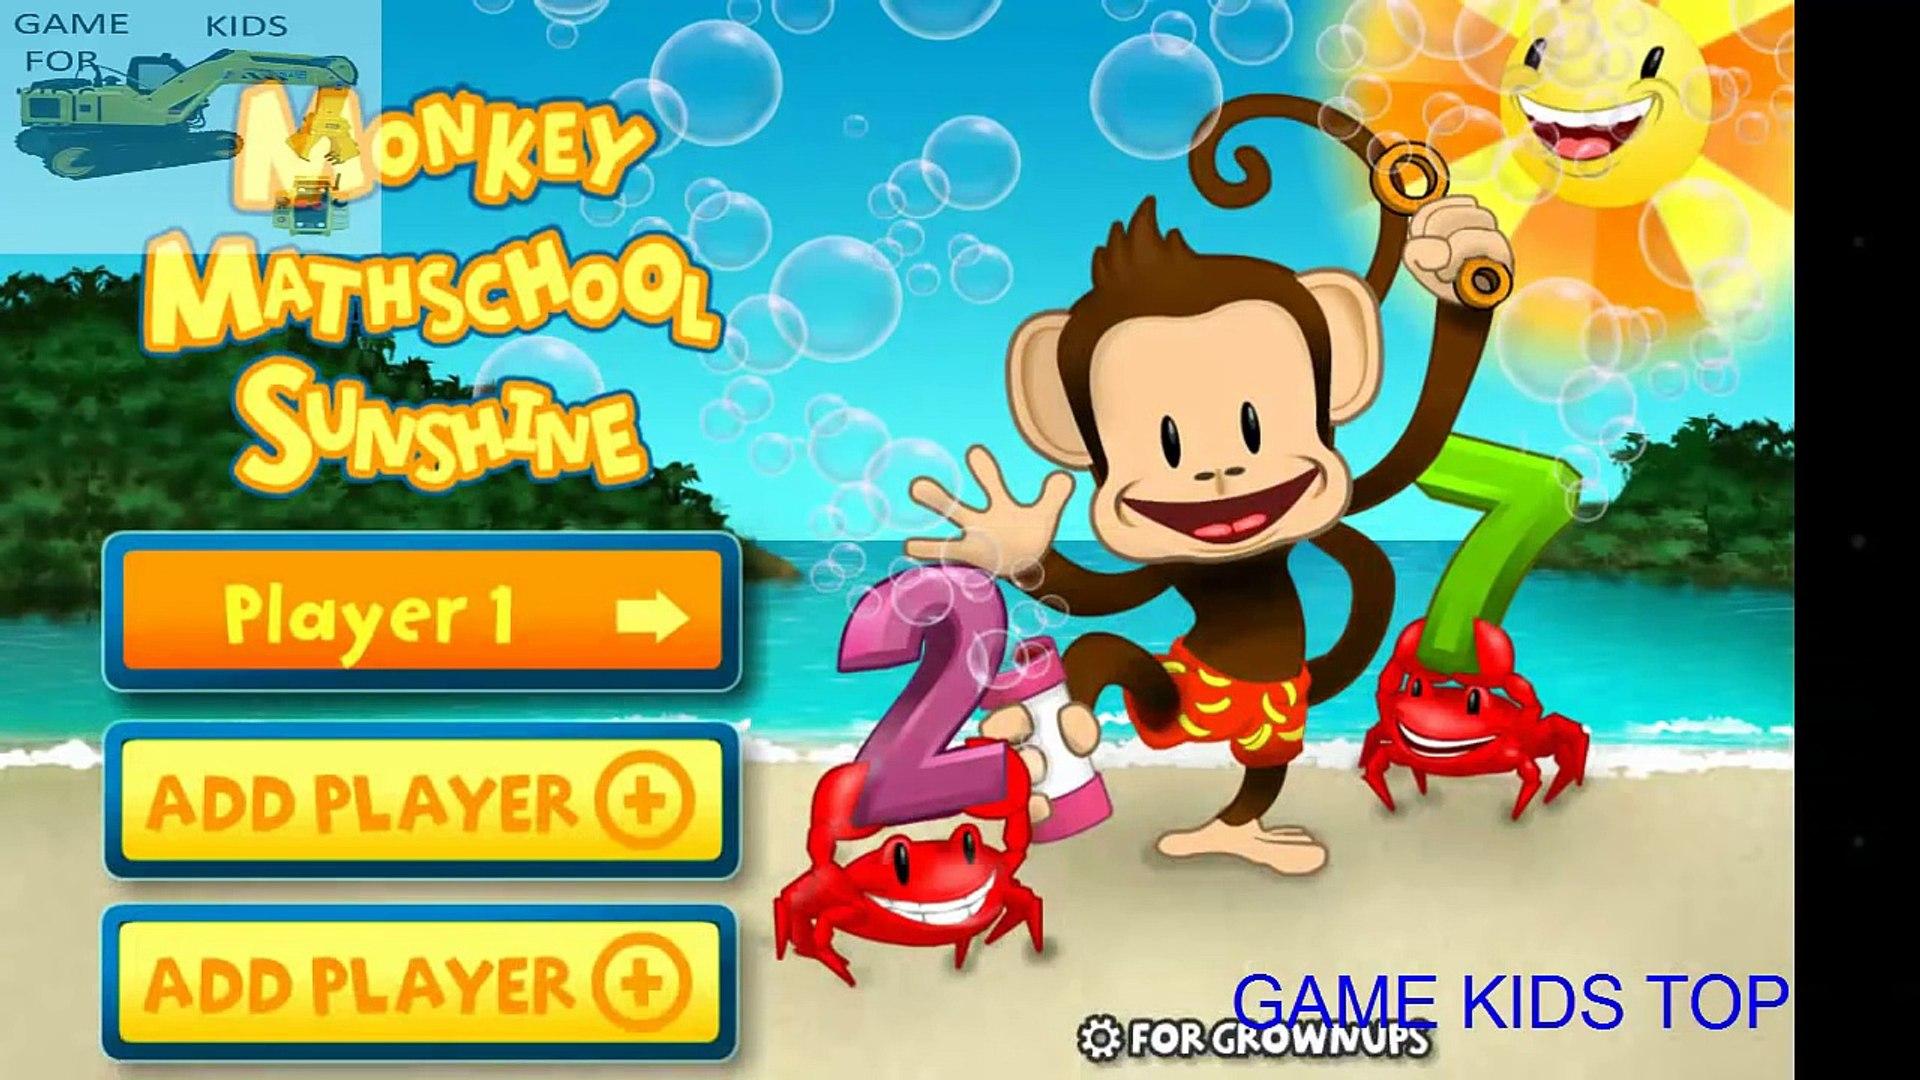 Monkey Math School Sunshine - Learn math for Kid || Education App for Kids 2016 - Game Kids Top